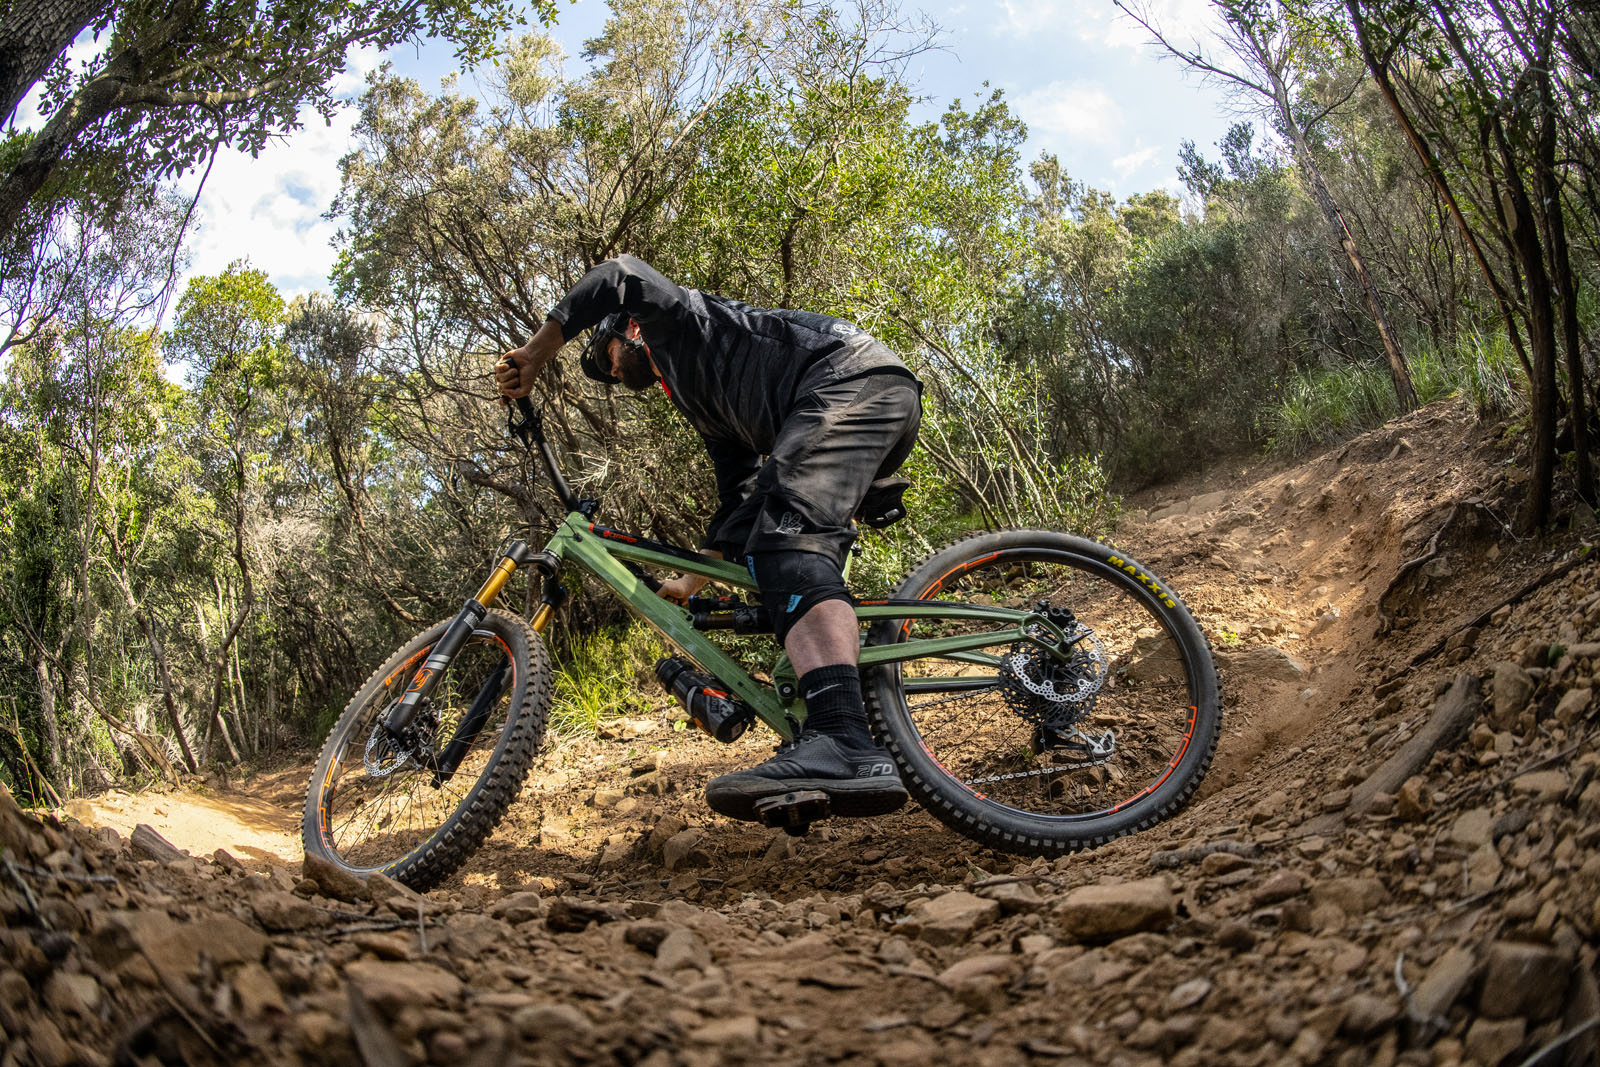 2019 Orange Alpine 6 Wasabi green review